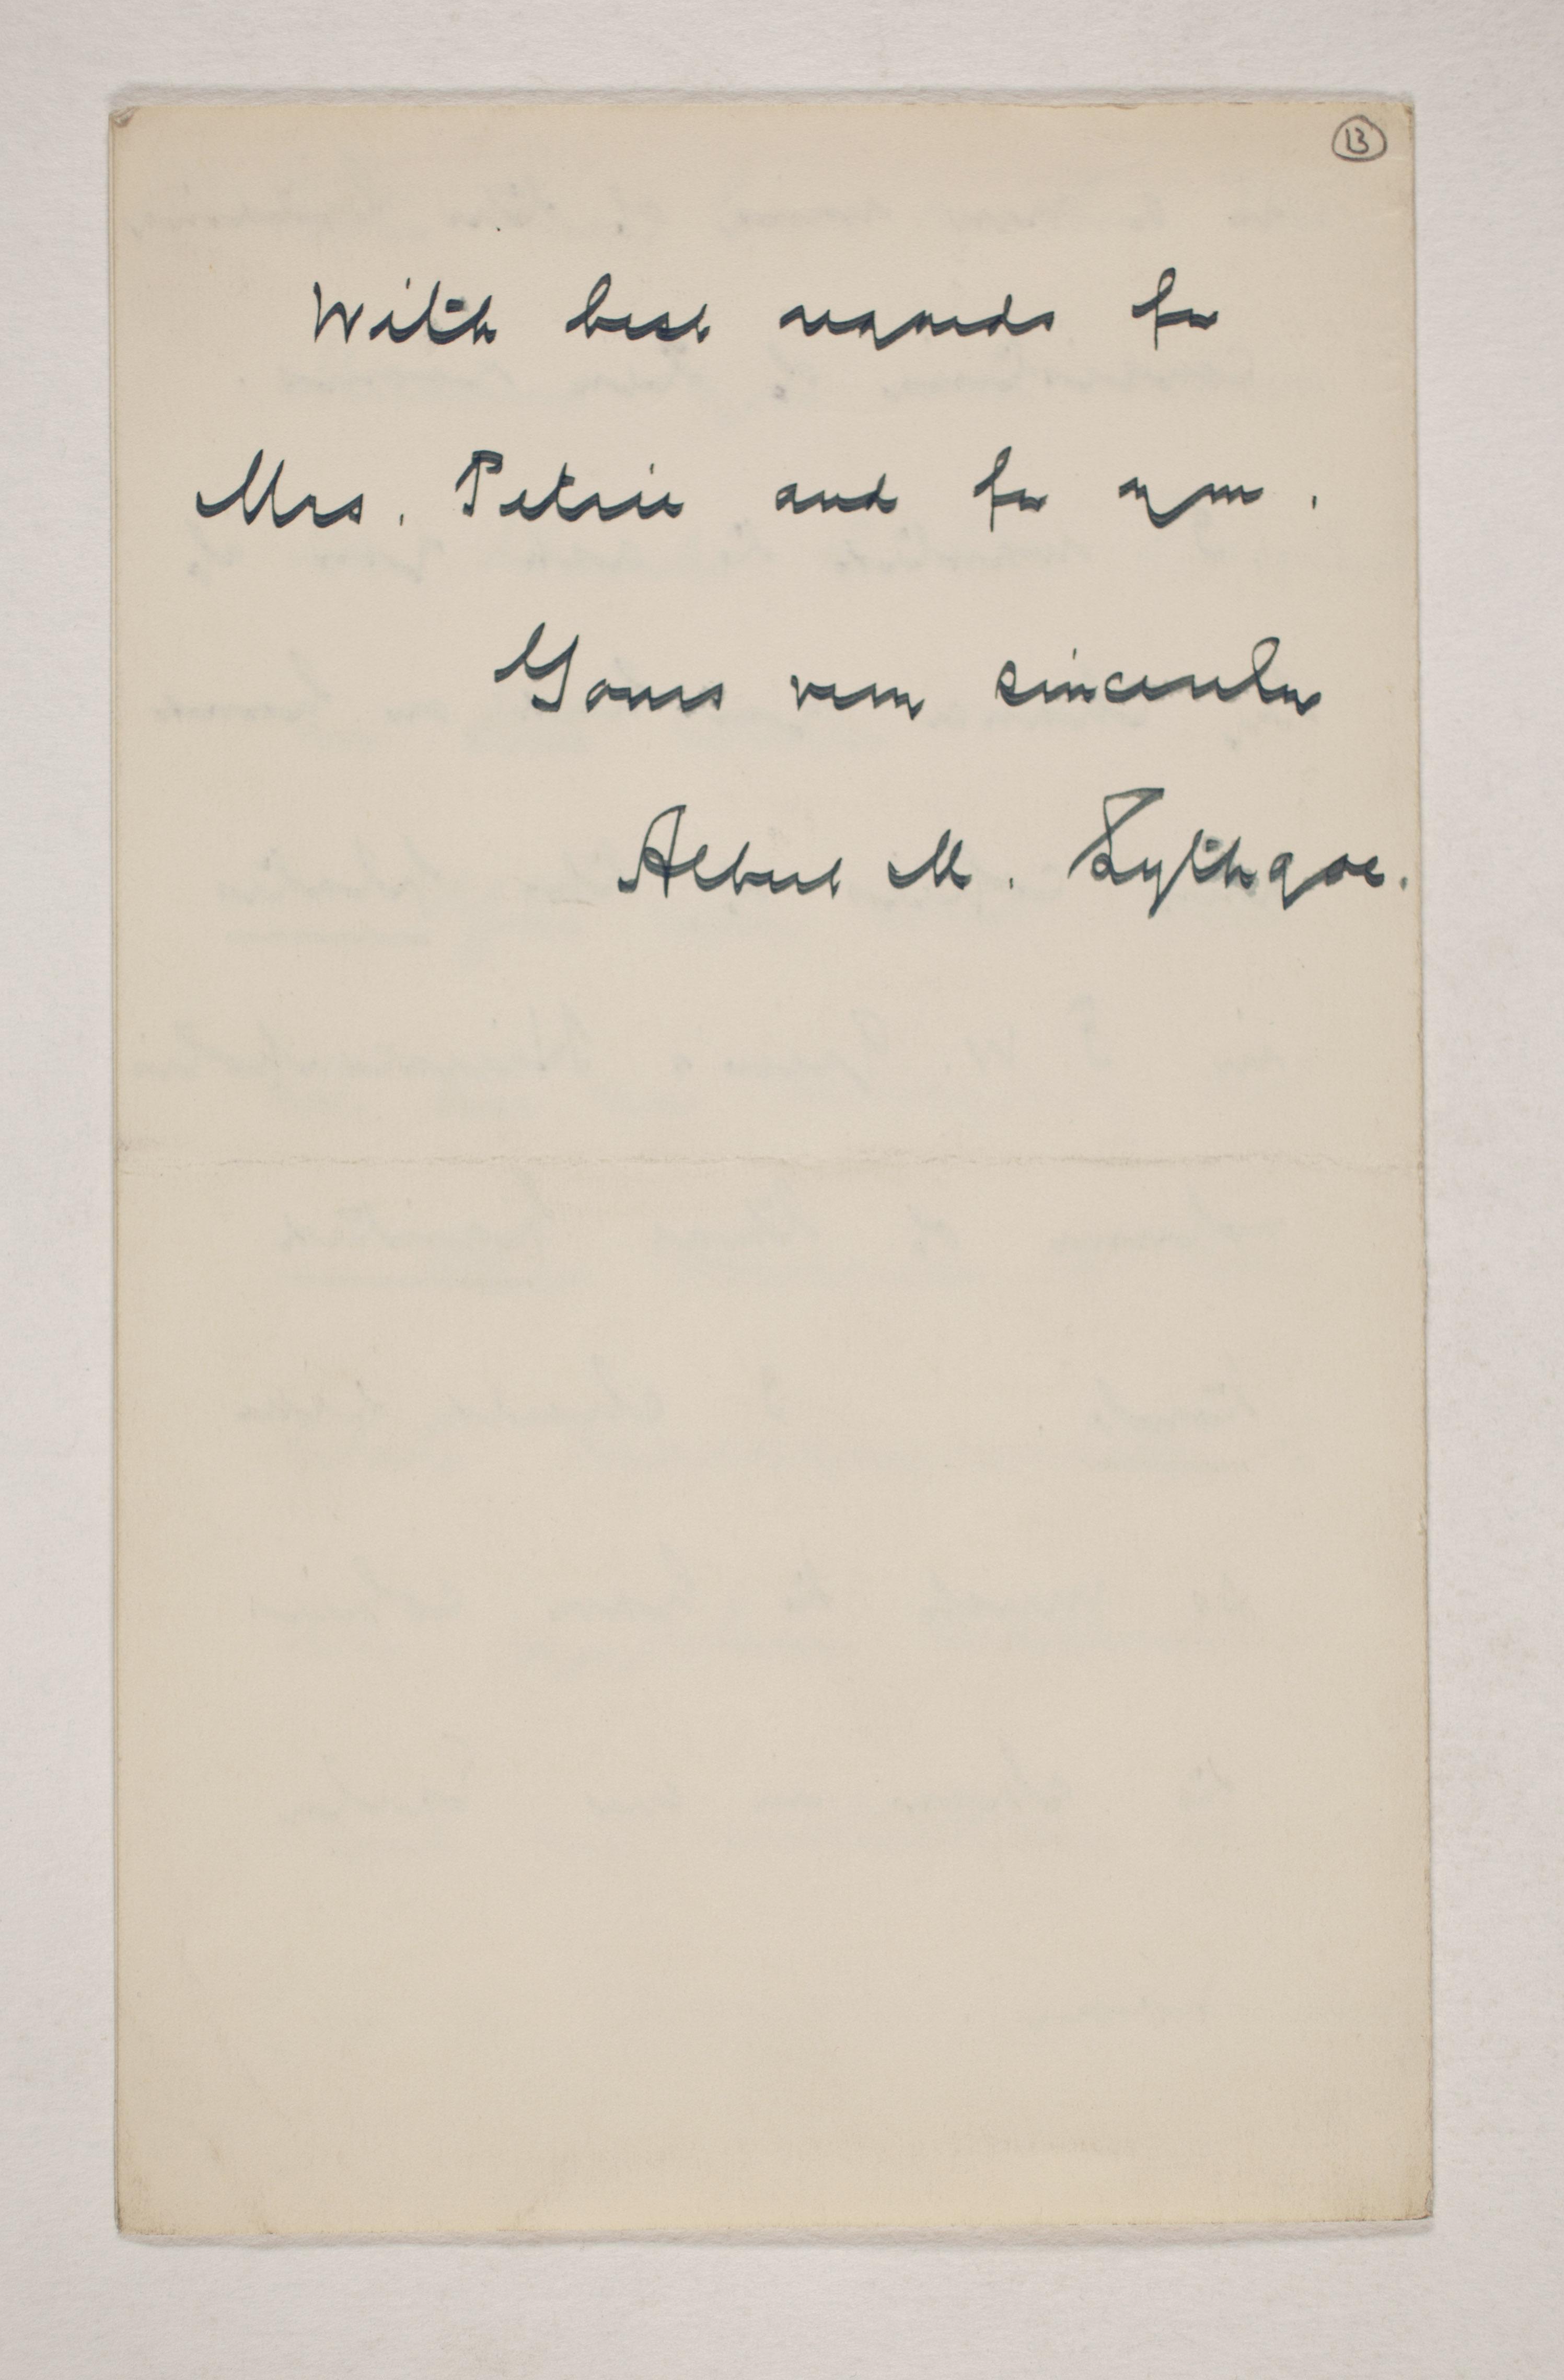 1909-10 Meidum, Memphis Correspondence PMA/WFP1/D/18/13.3